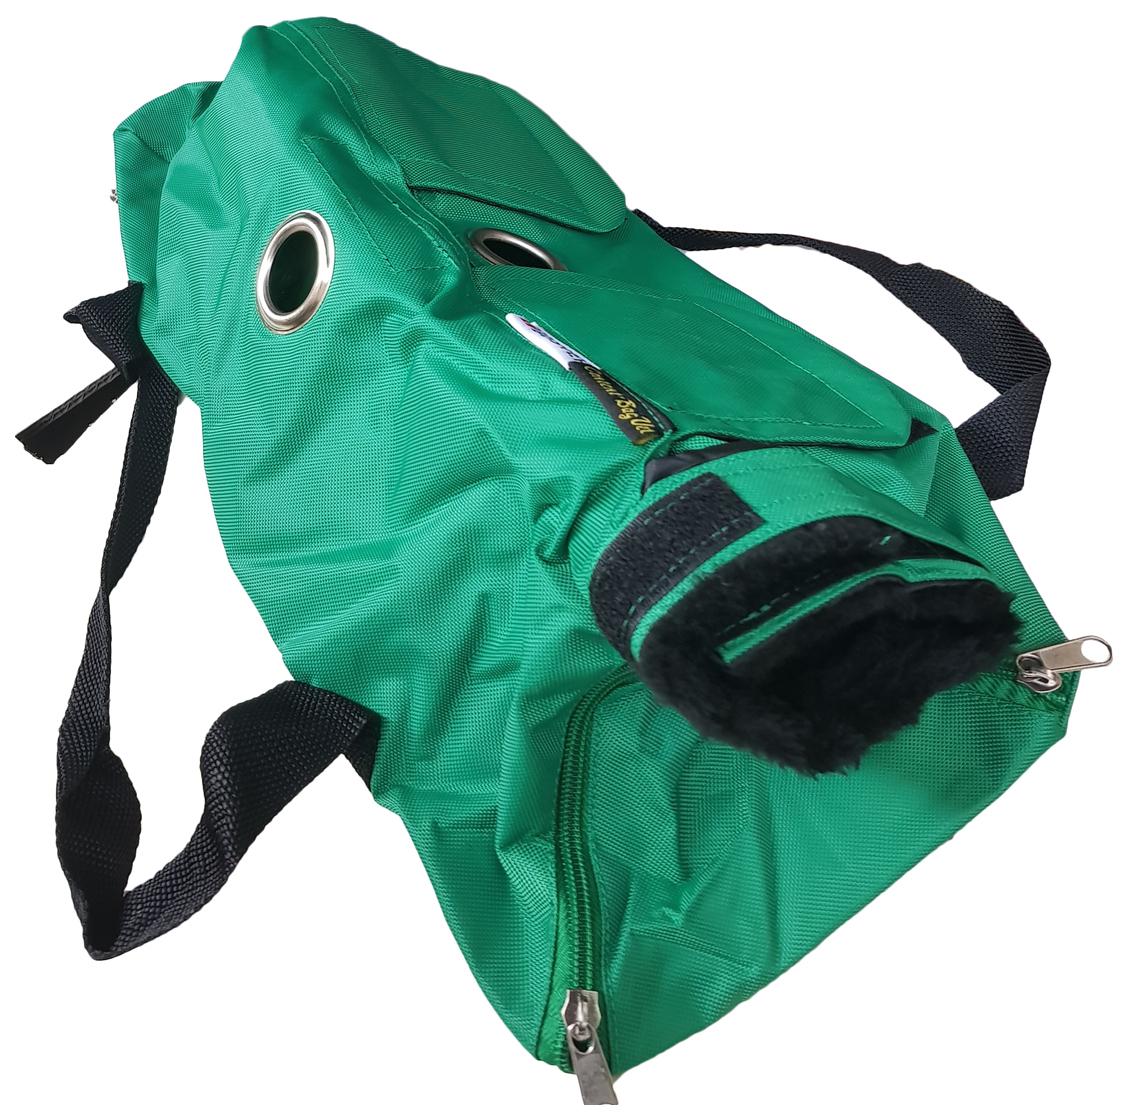 Сумка для обследования животных Kruuse Buster Vet Examination Bag зеленая L 4-6кг.